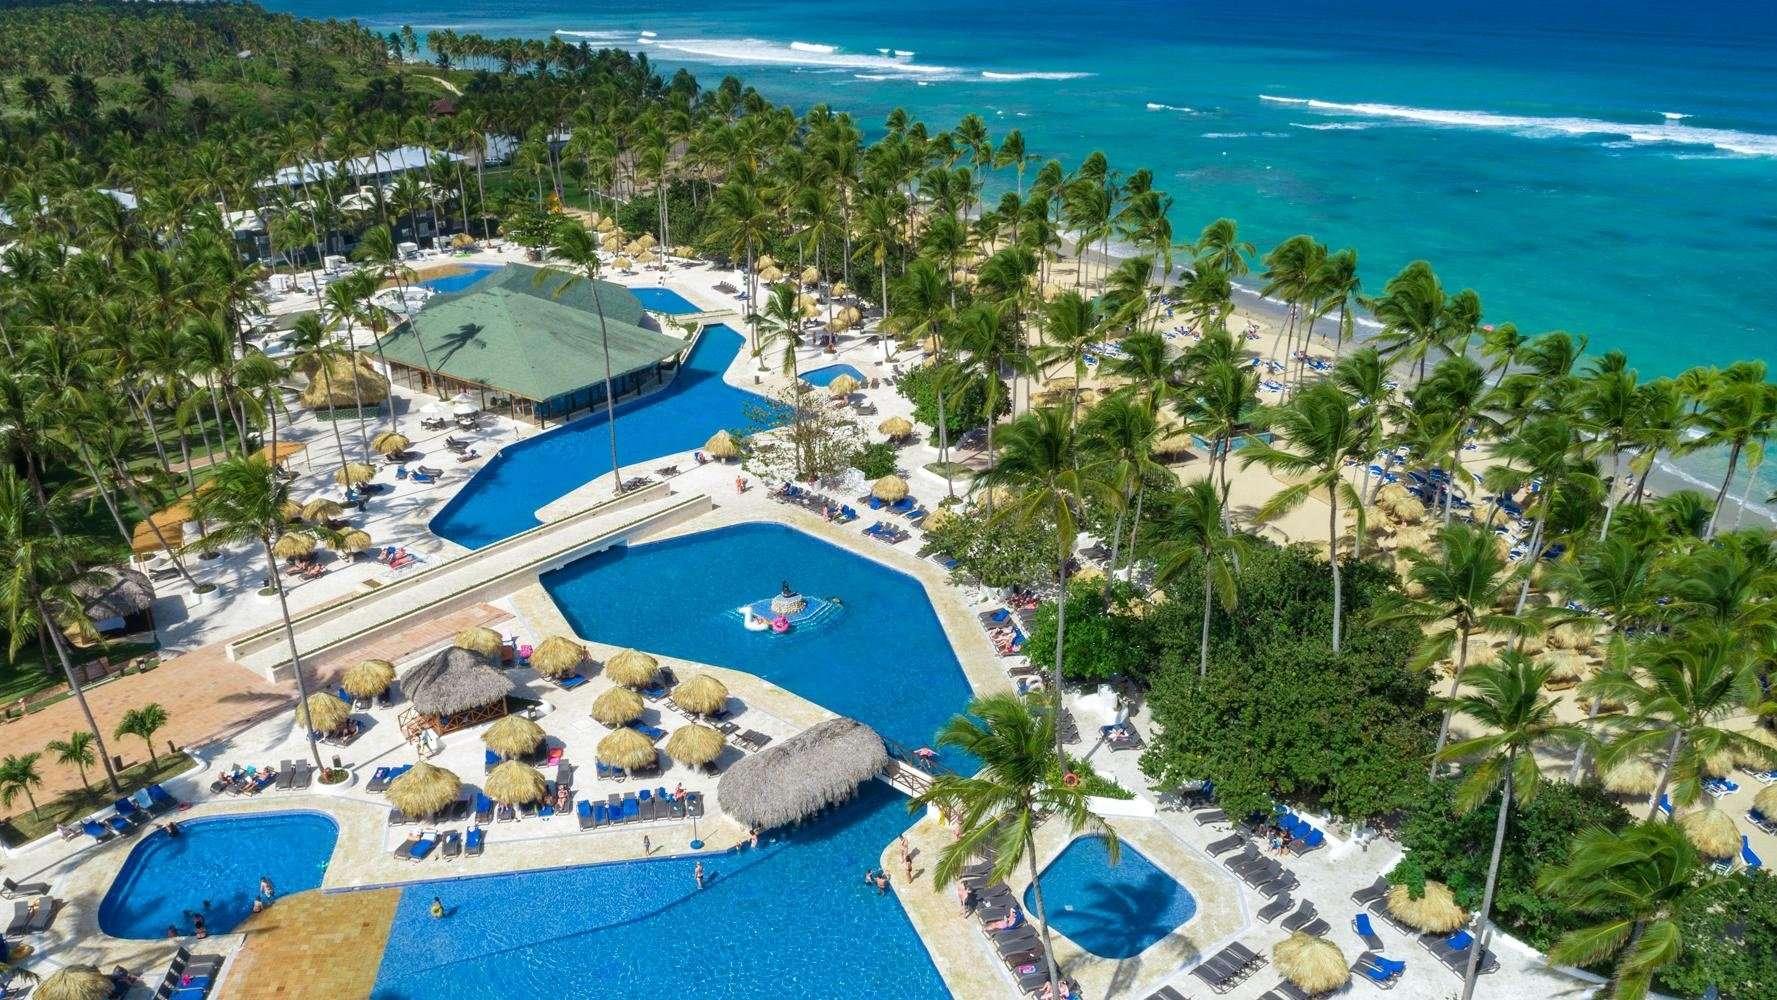 Grand Sirenis Punta Cana - Best Family Friendly Resorts